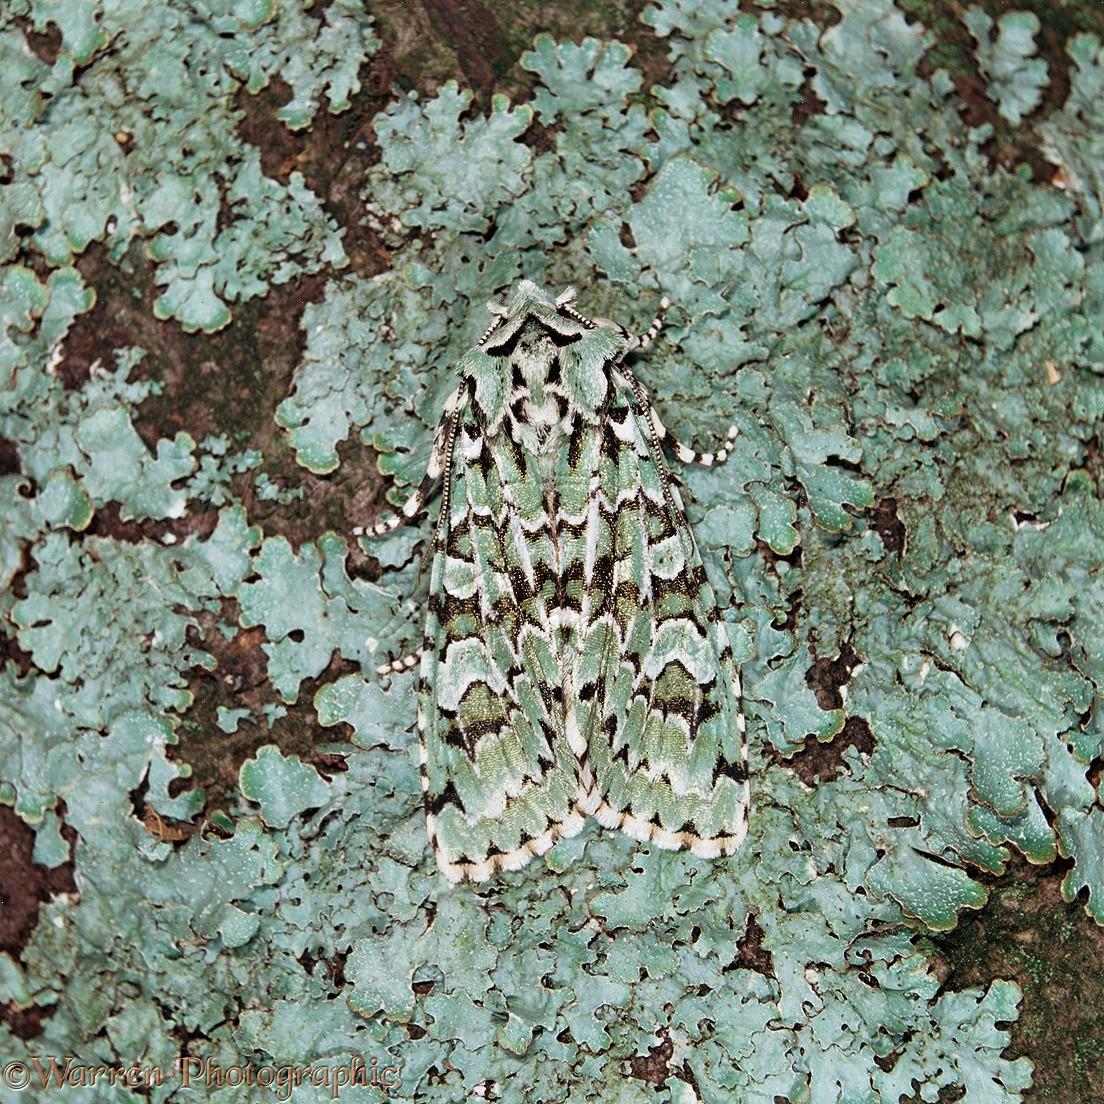 merveille du jour moth camouflaged on lichen photo wp16415. Black Bedroom Furniture Sets. Home Design Ideas